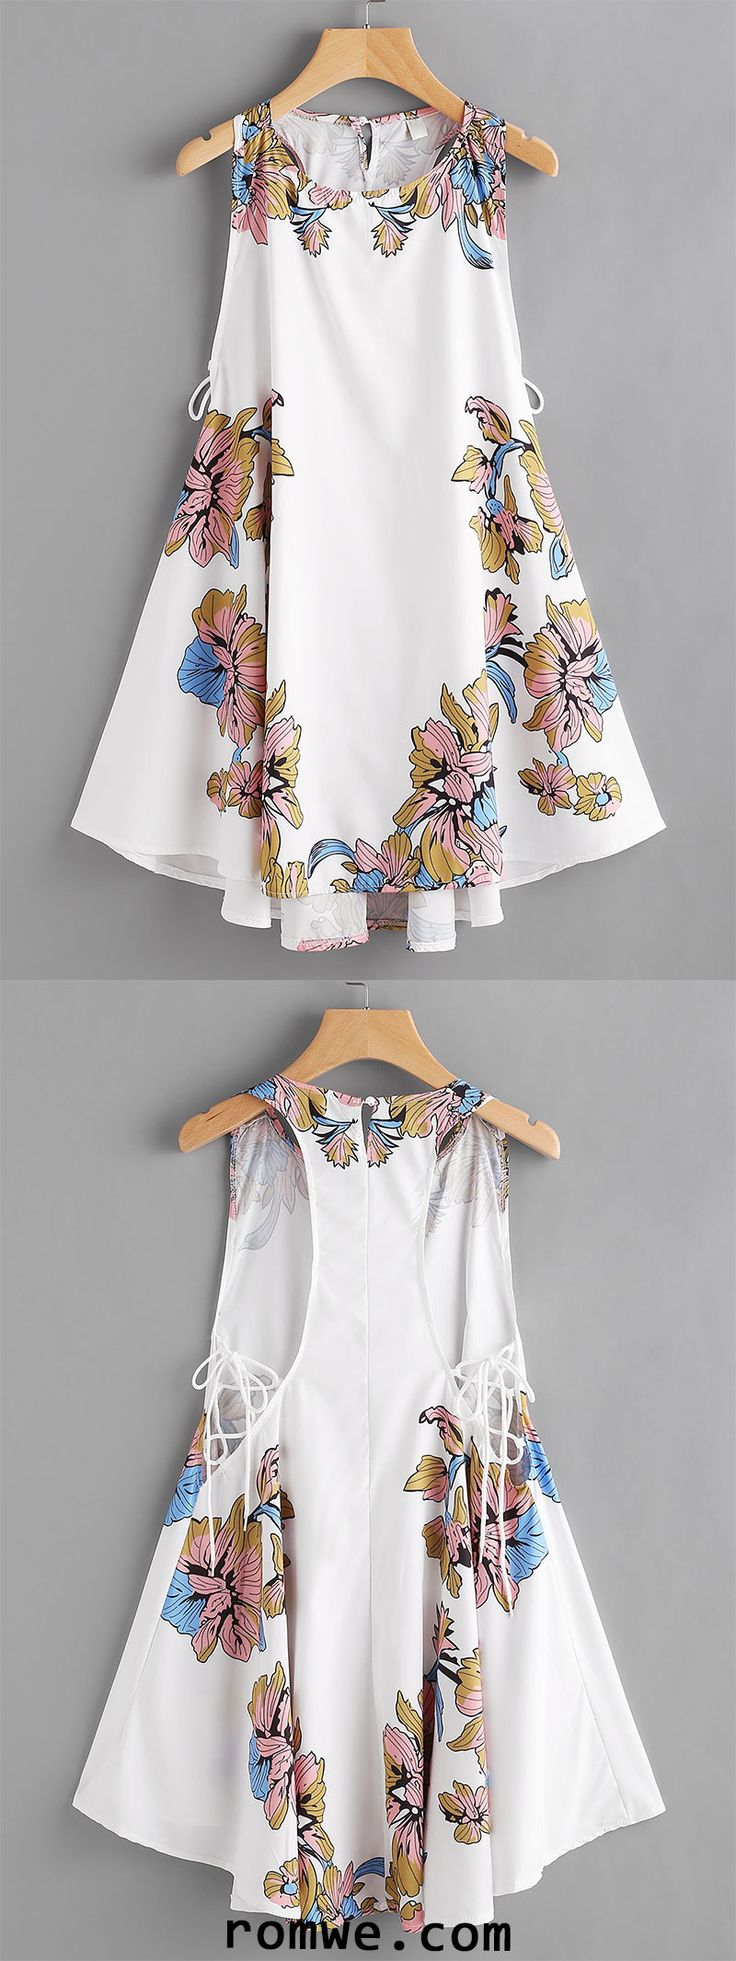 Floral Print Lace Up Side Dress